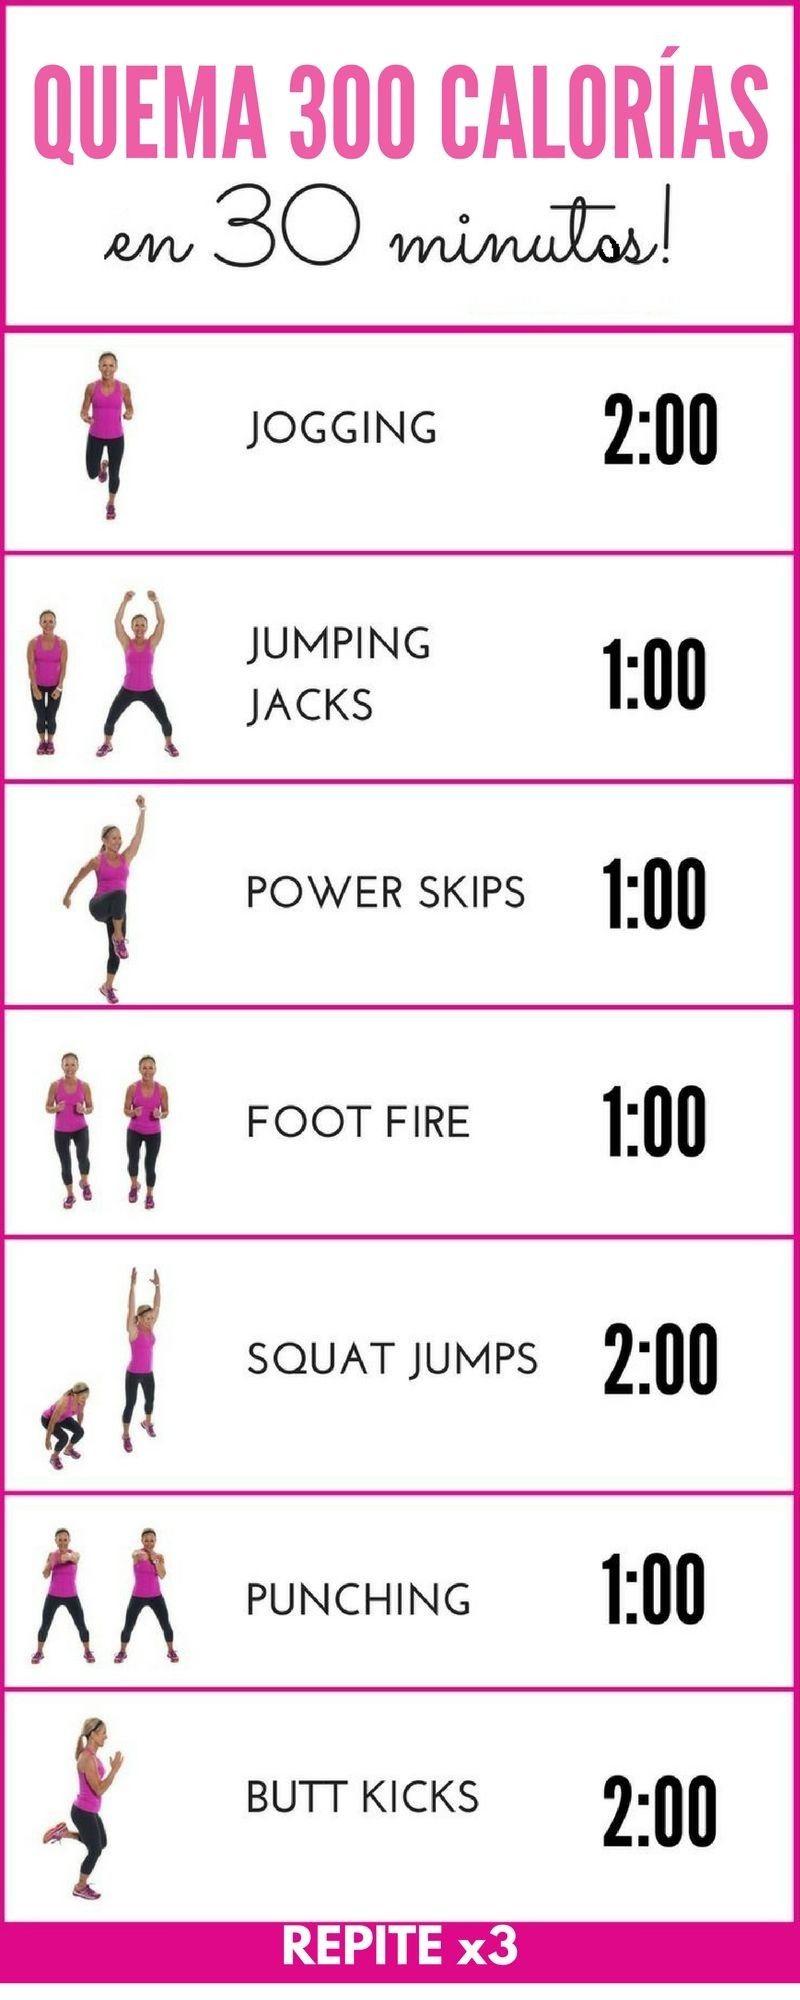 Ejercicio Intenso Quema Grasa Para Adelgazar Quema Calorias En El Entrenamiento Que Puedes Hacer En Casa O Calorie Workout 30 Minute Workout Bodyweight Workout